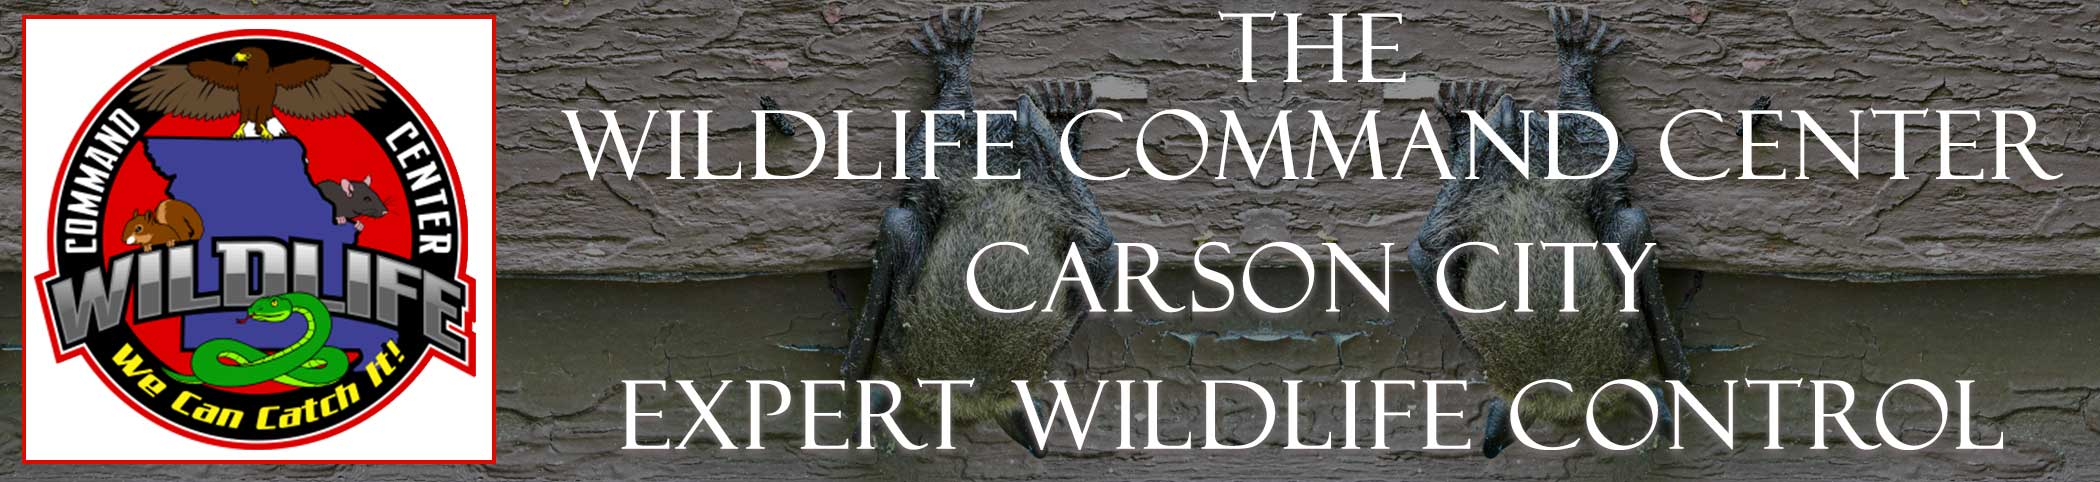 carson-city-wildlife-command-center